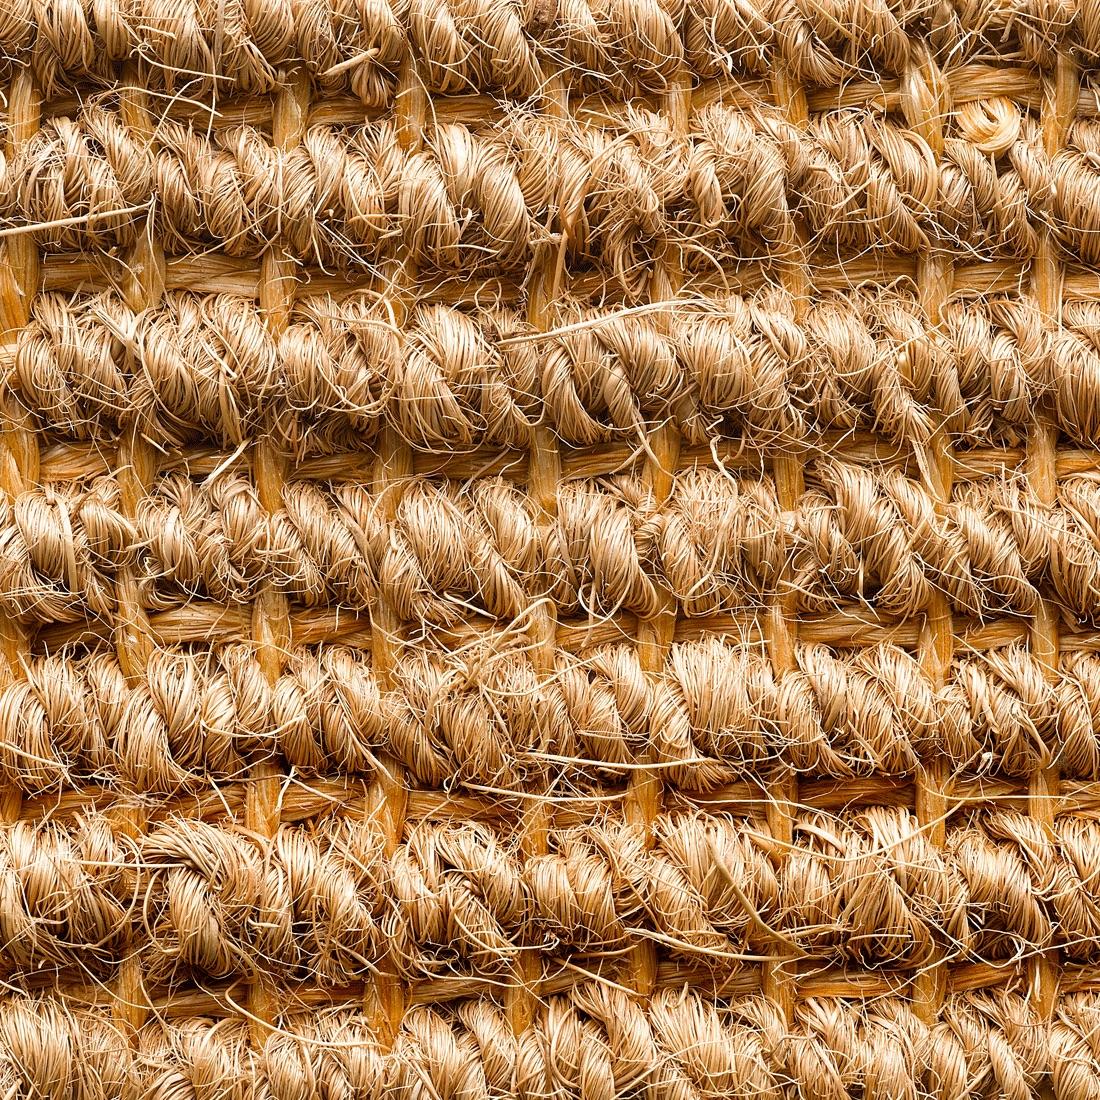 Vloerkleed Sumatra Beige Taupe | 200 x 290 cm